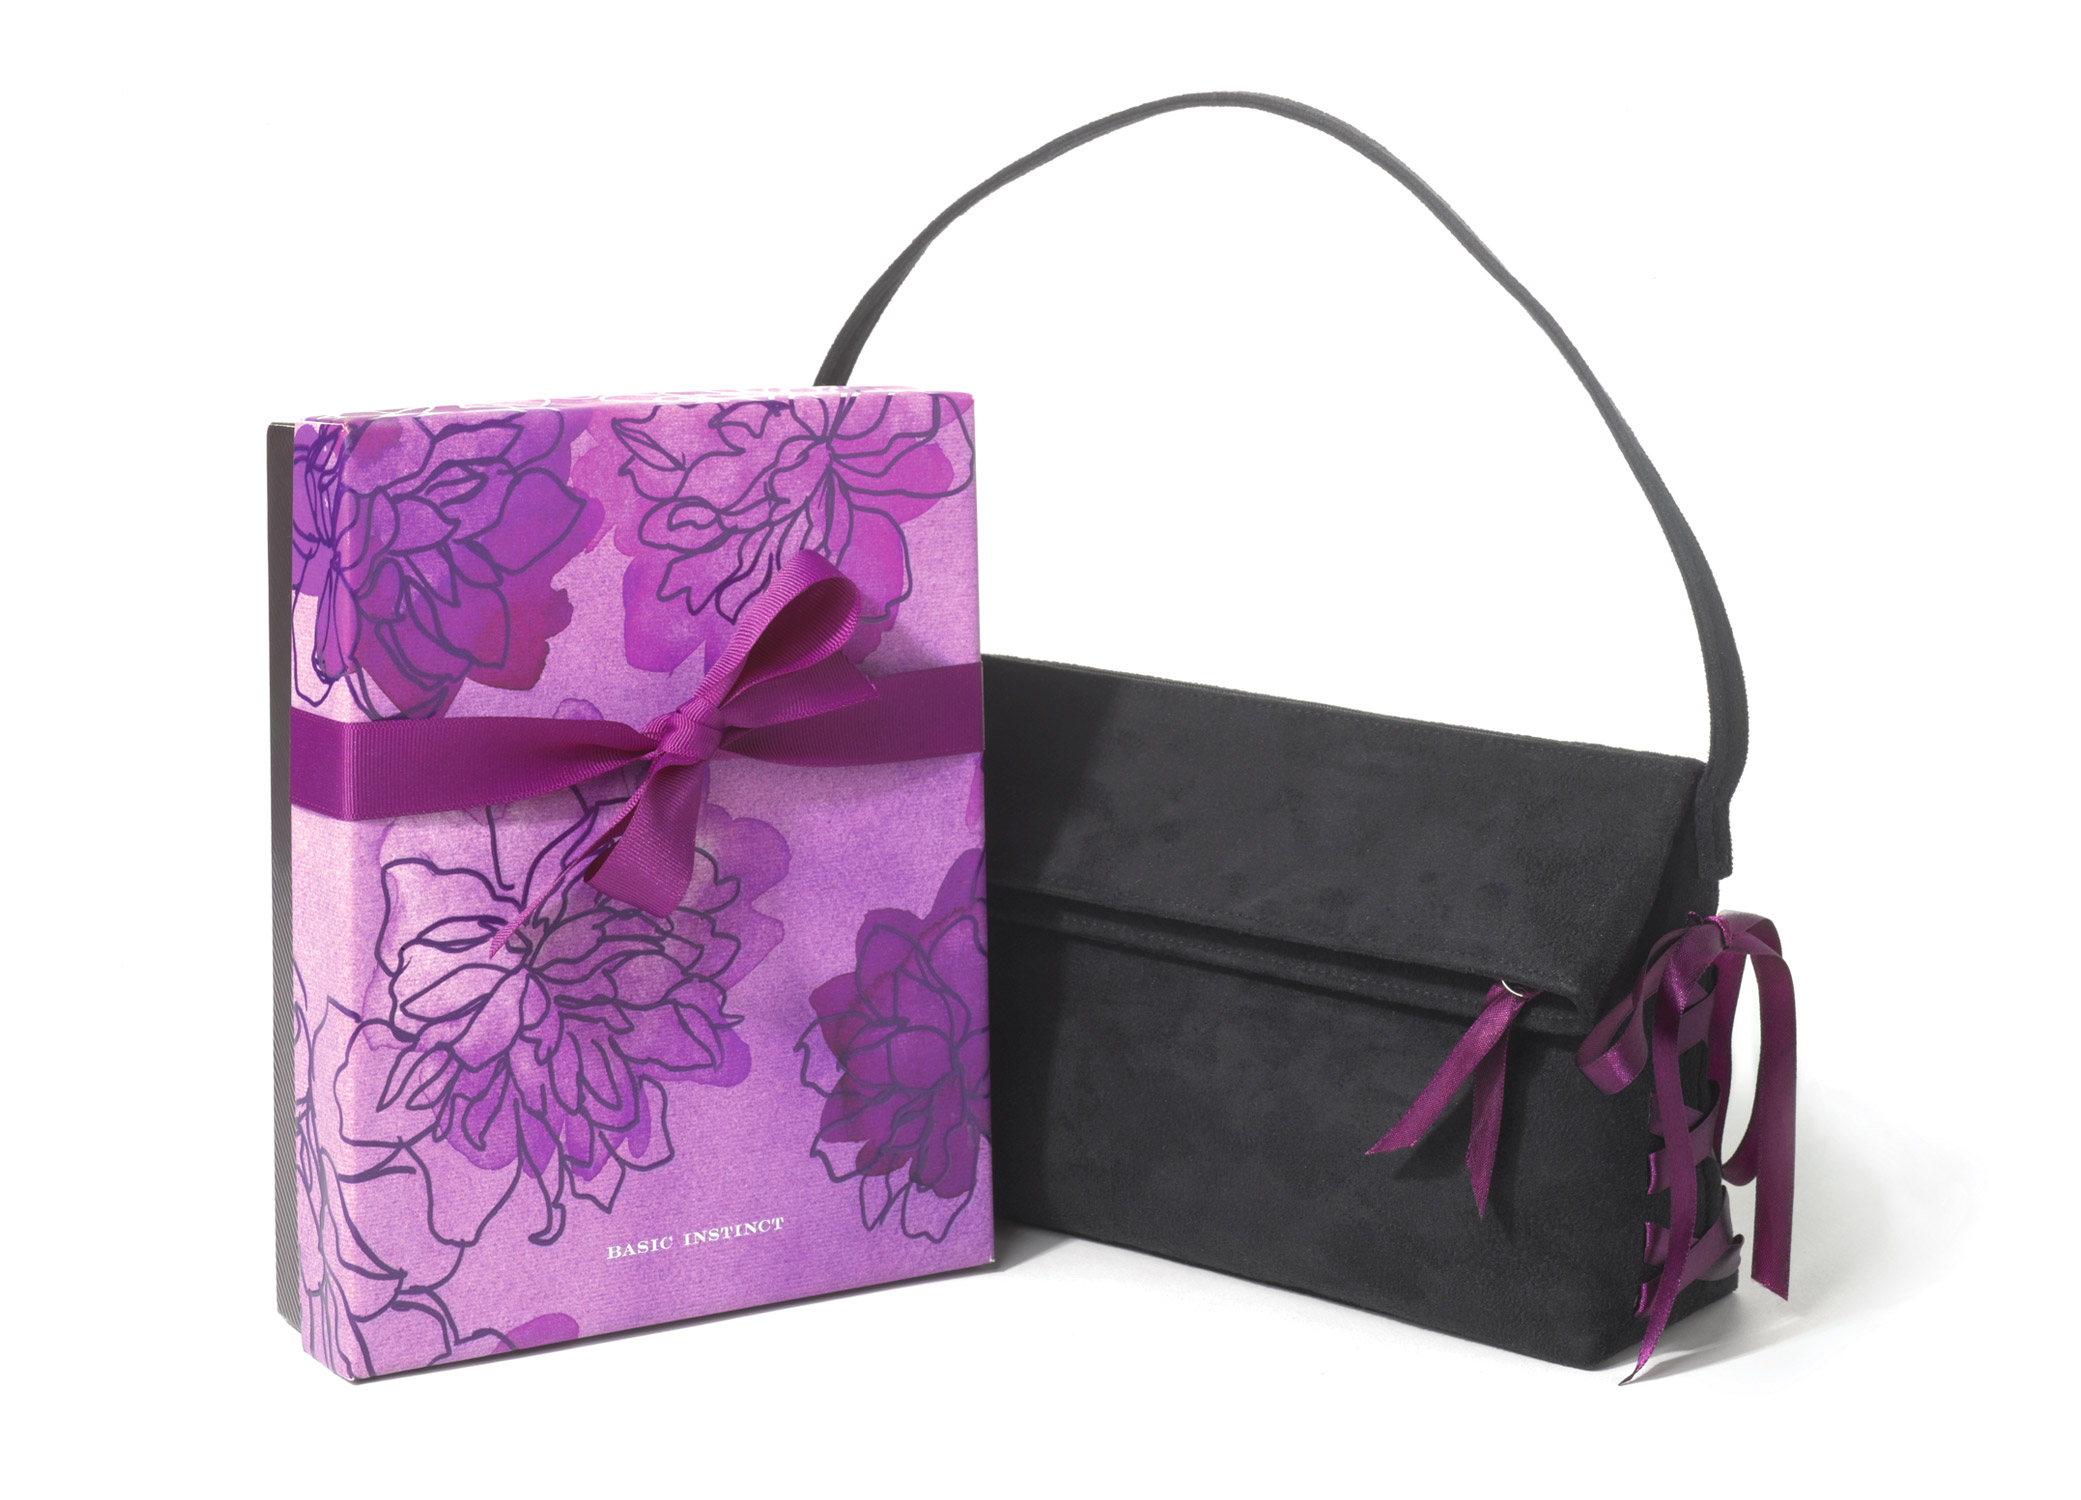 Unique gift boxes packaging design for Victoria's Secret Basic Instinct with black handbag and floral box.